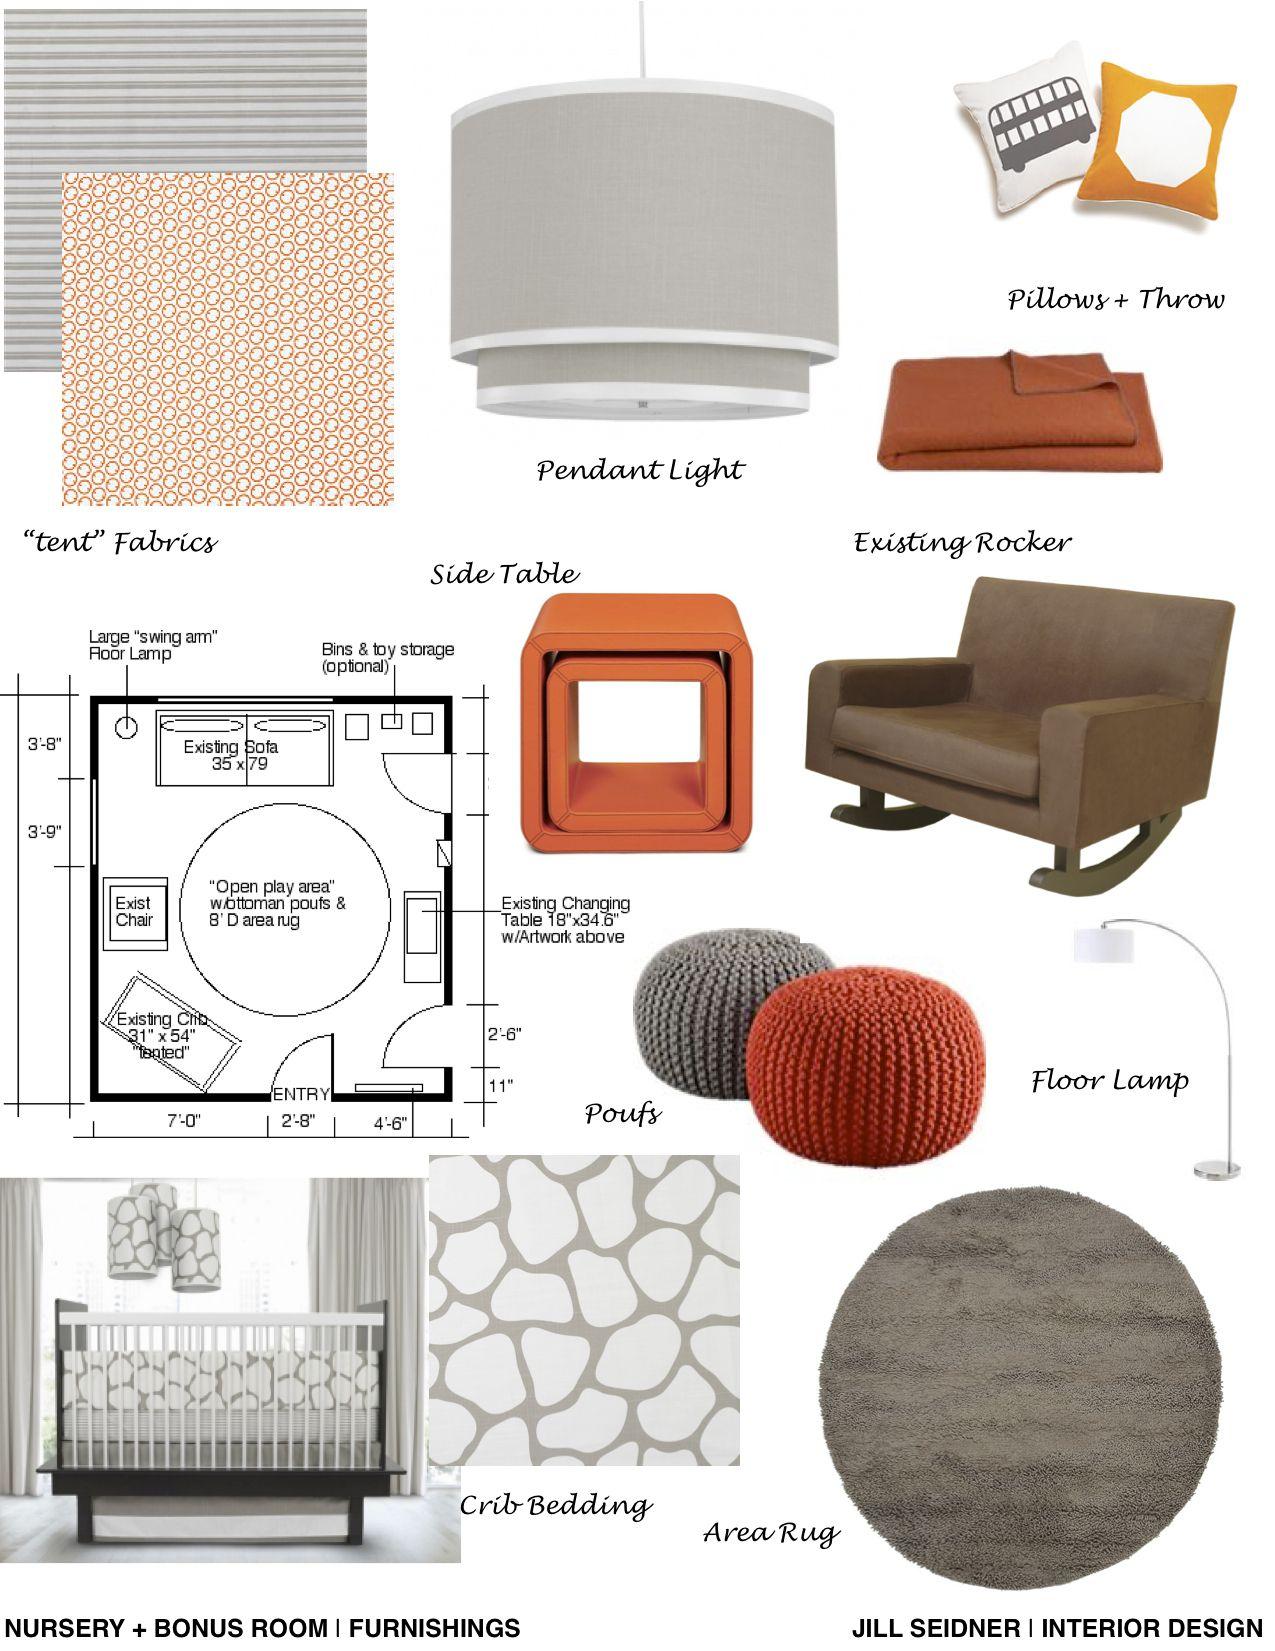 Furnishings Concept Board For Nursery Project Interior Design Mood Board Interior Design Business Interior Design Boards